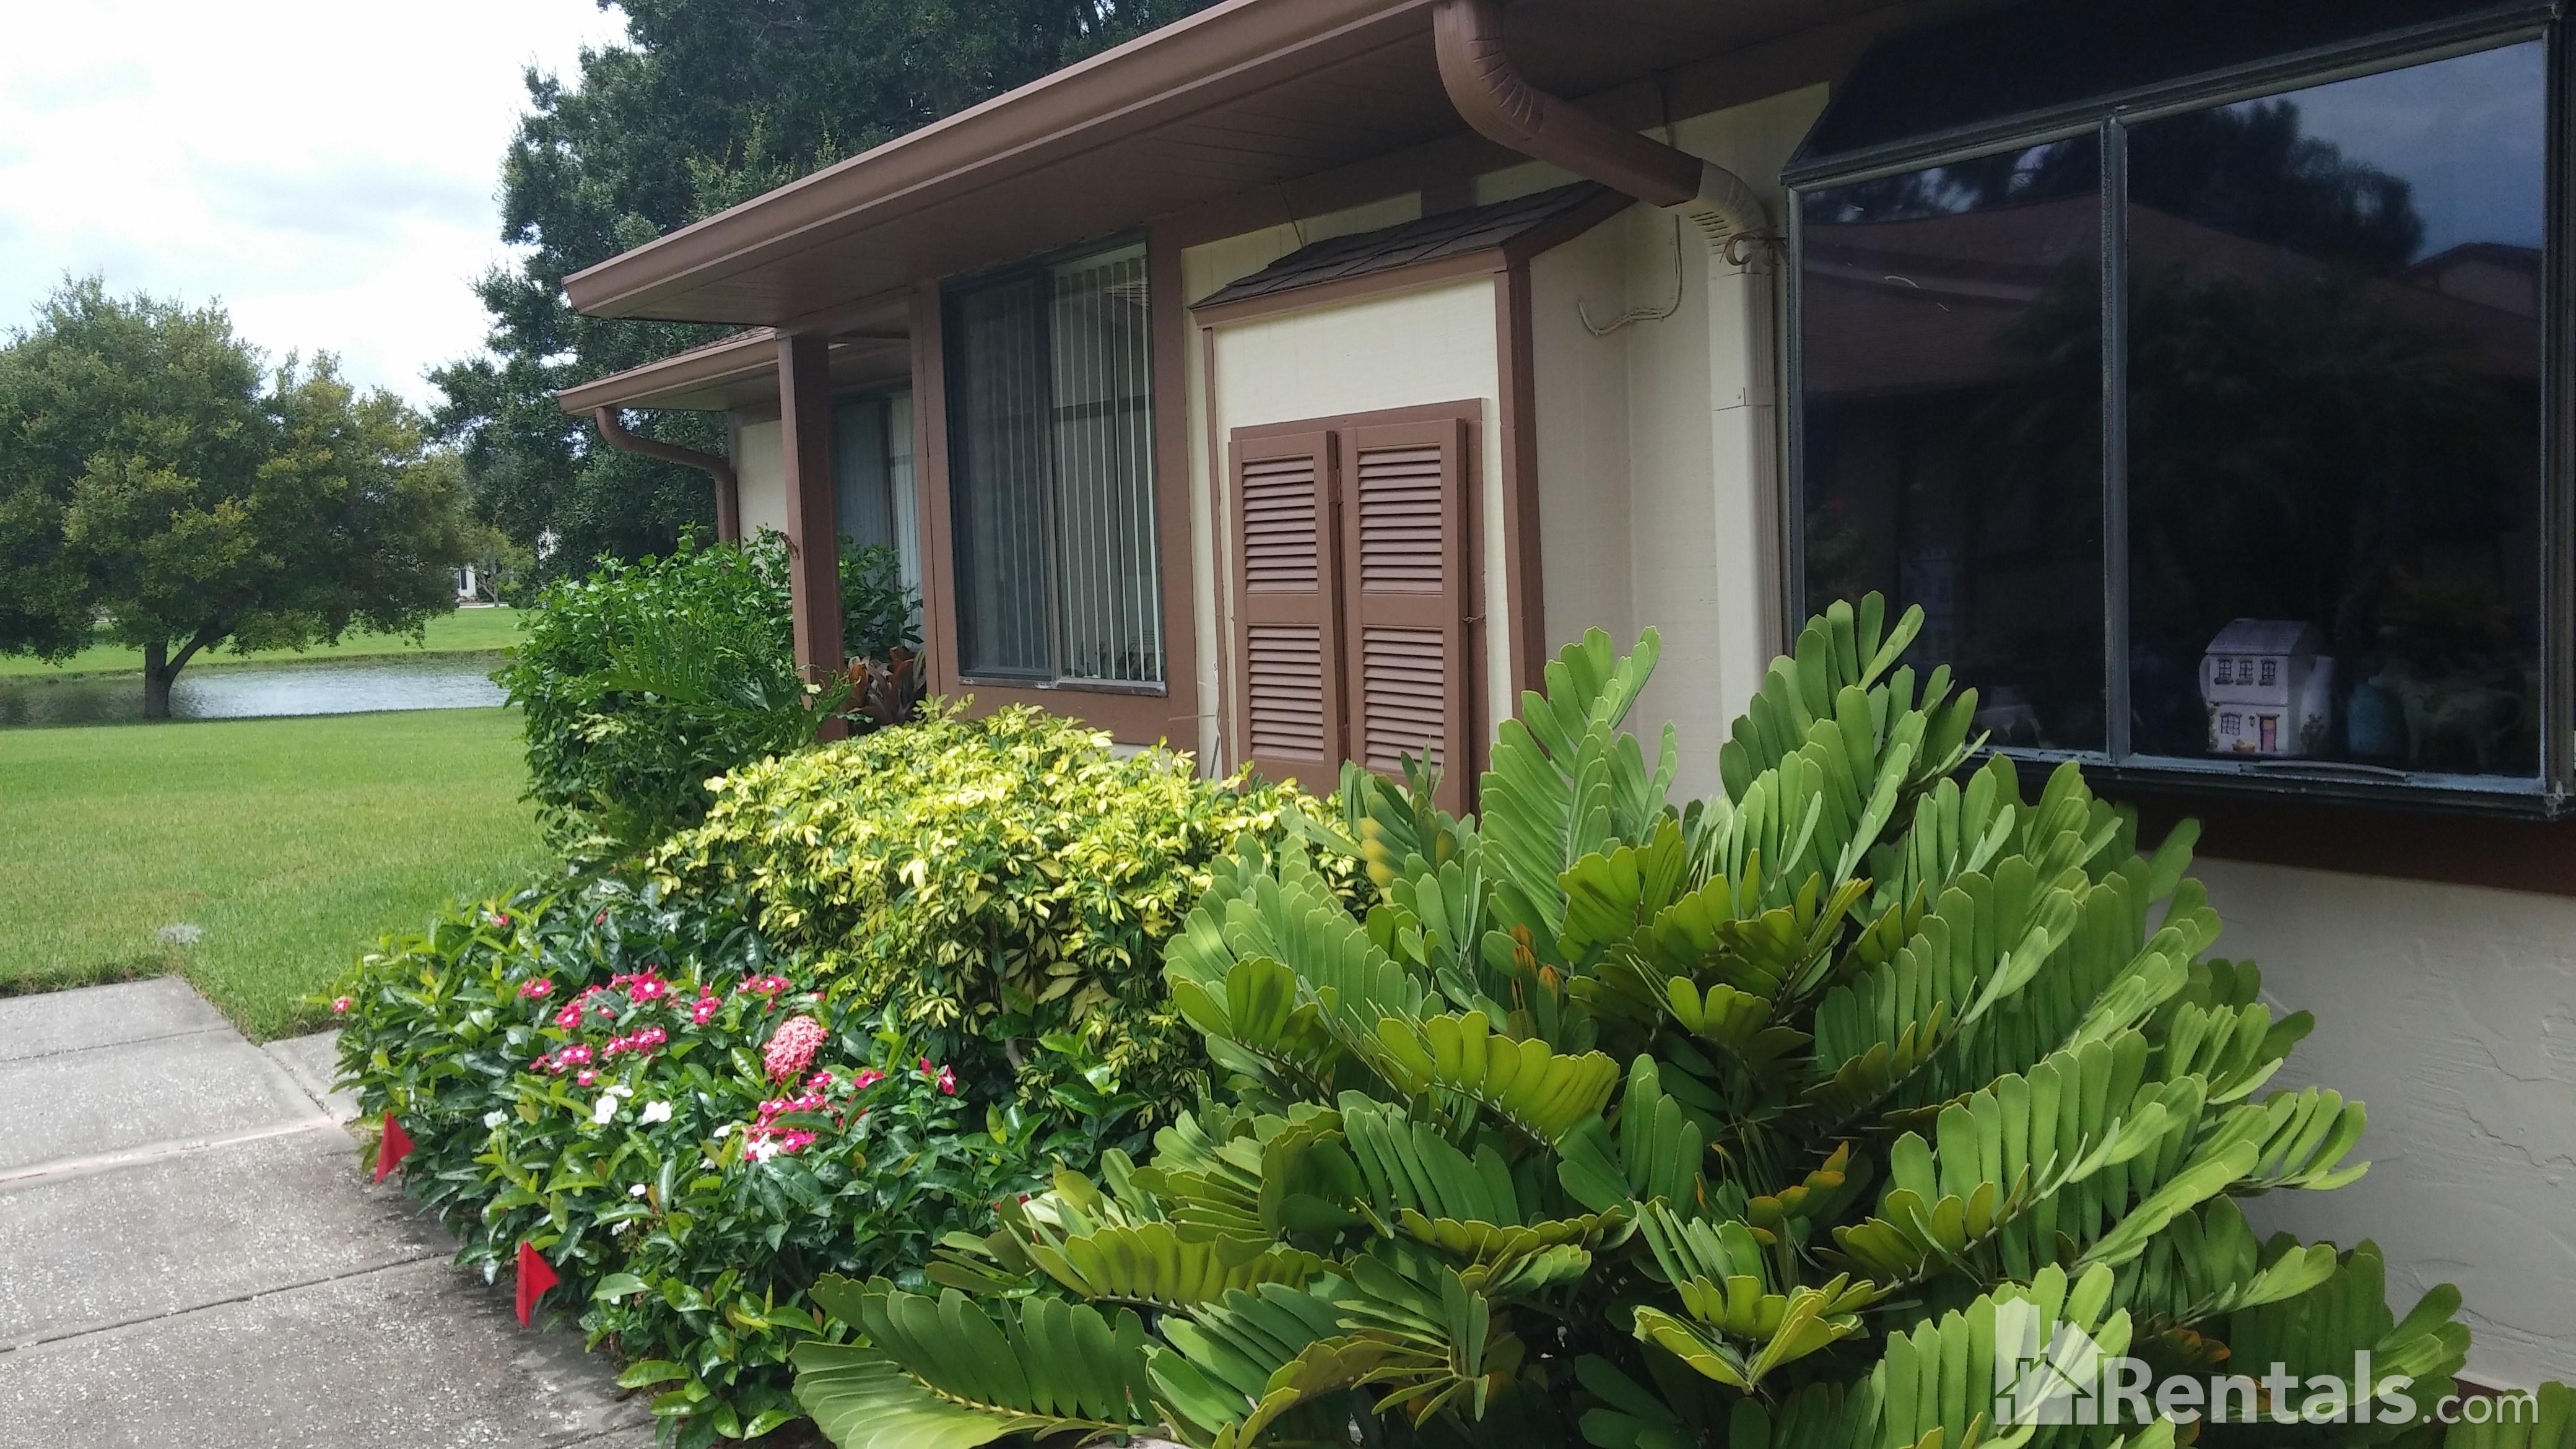 Villas For Rent In Oldsmar Fl